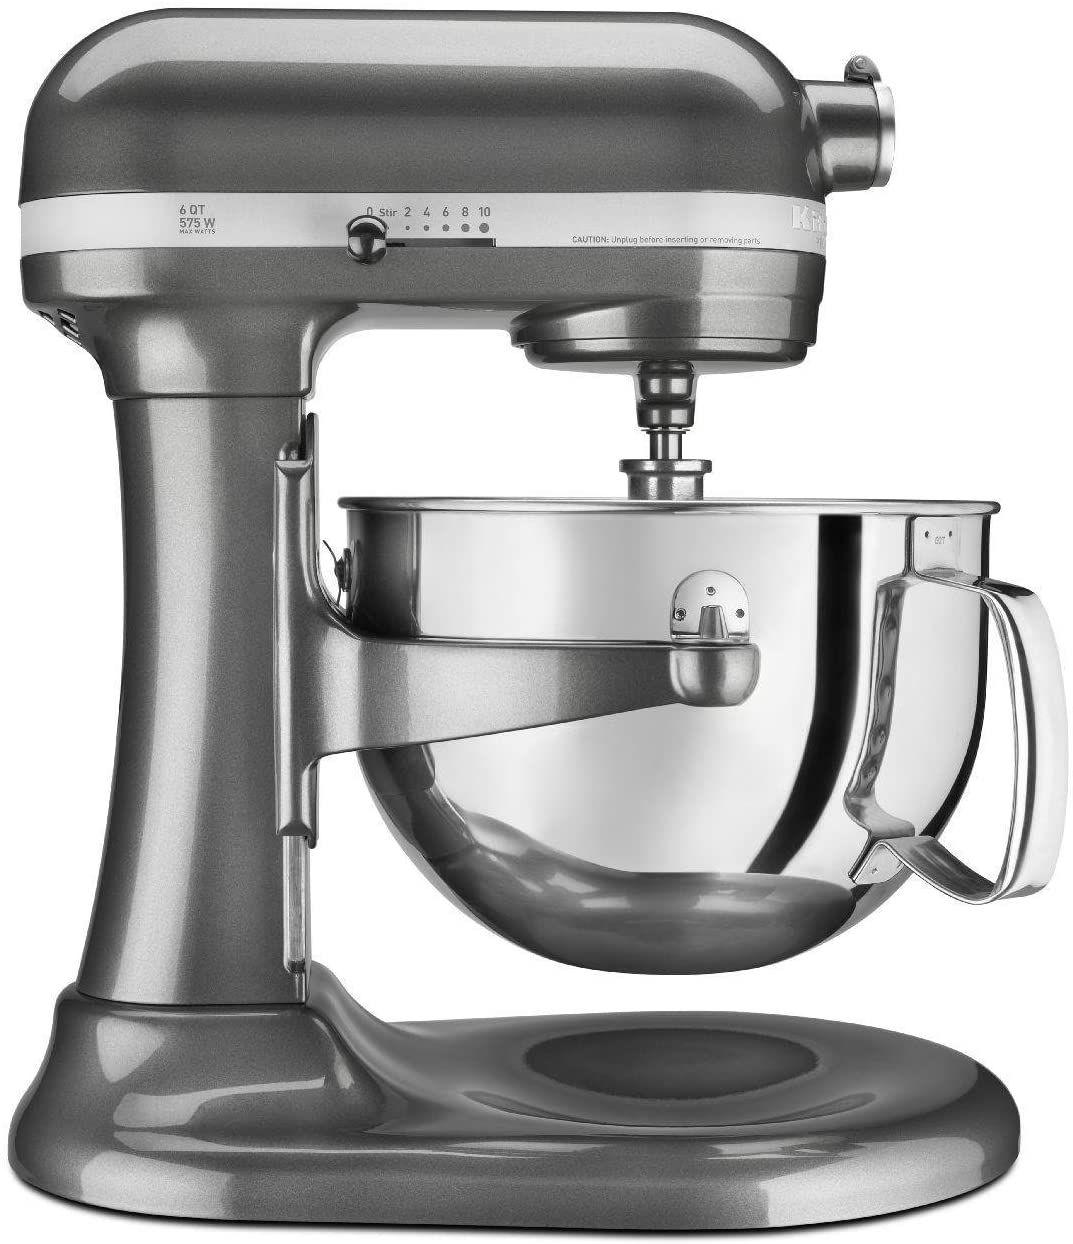 KitchenAid Pro 600 Series 6-Quart Bowl-Lift Stand Mixer KP26M1X